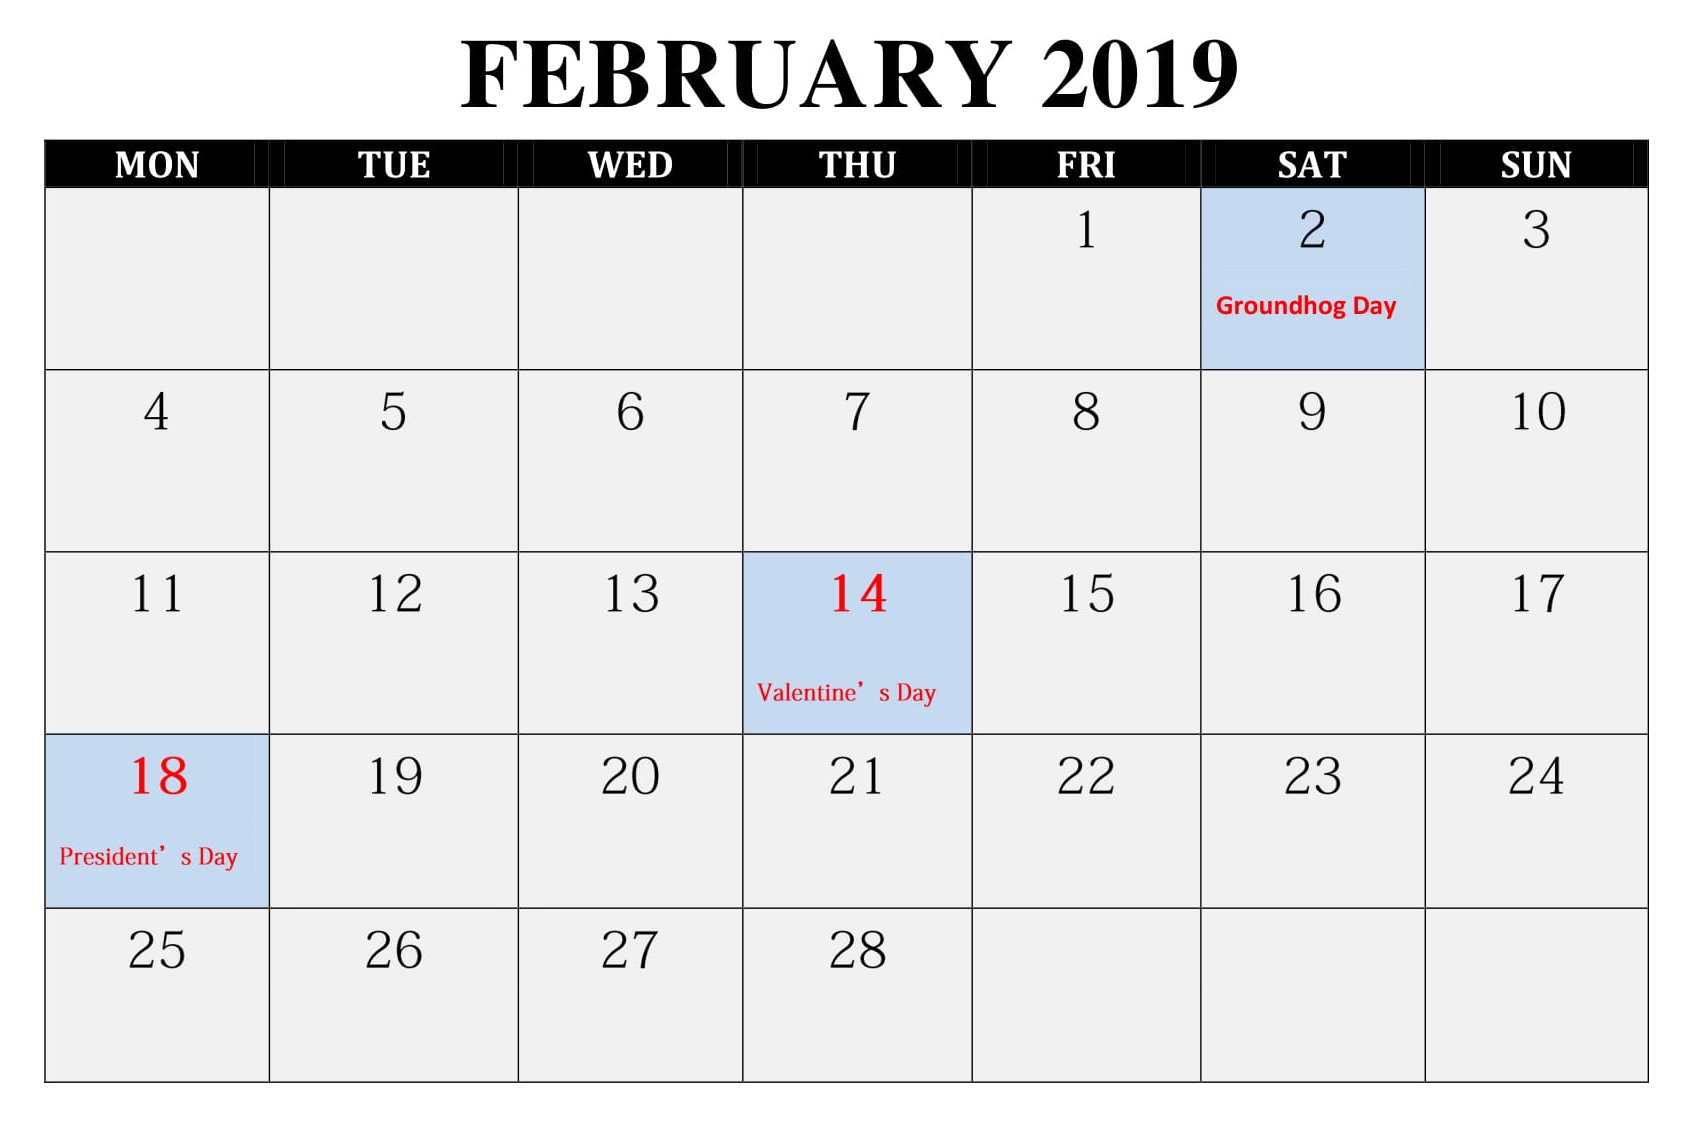 Calendar Feb 2019.Editable February 2019 Calendar Word Template In Portrait And Landscape